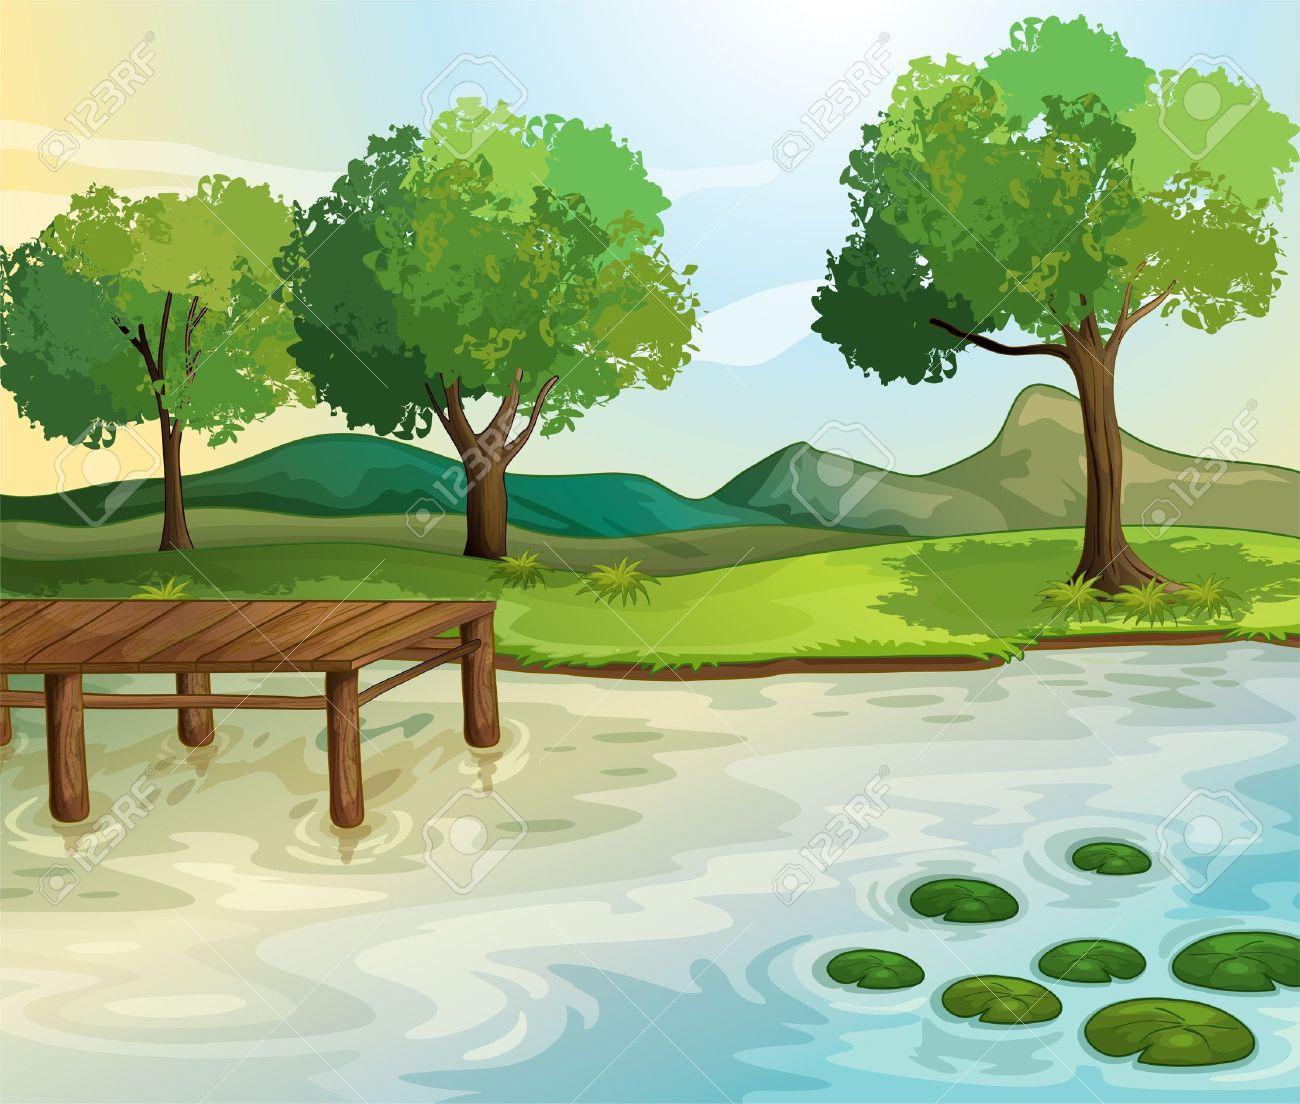 Illustration of a lake scene Stock Vector - 14923213